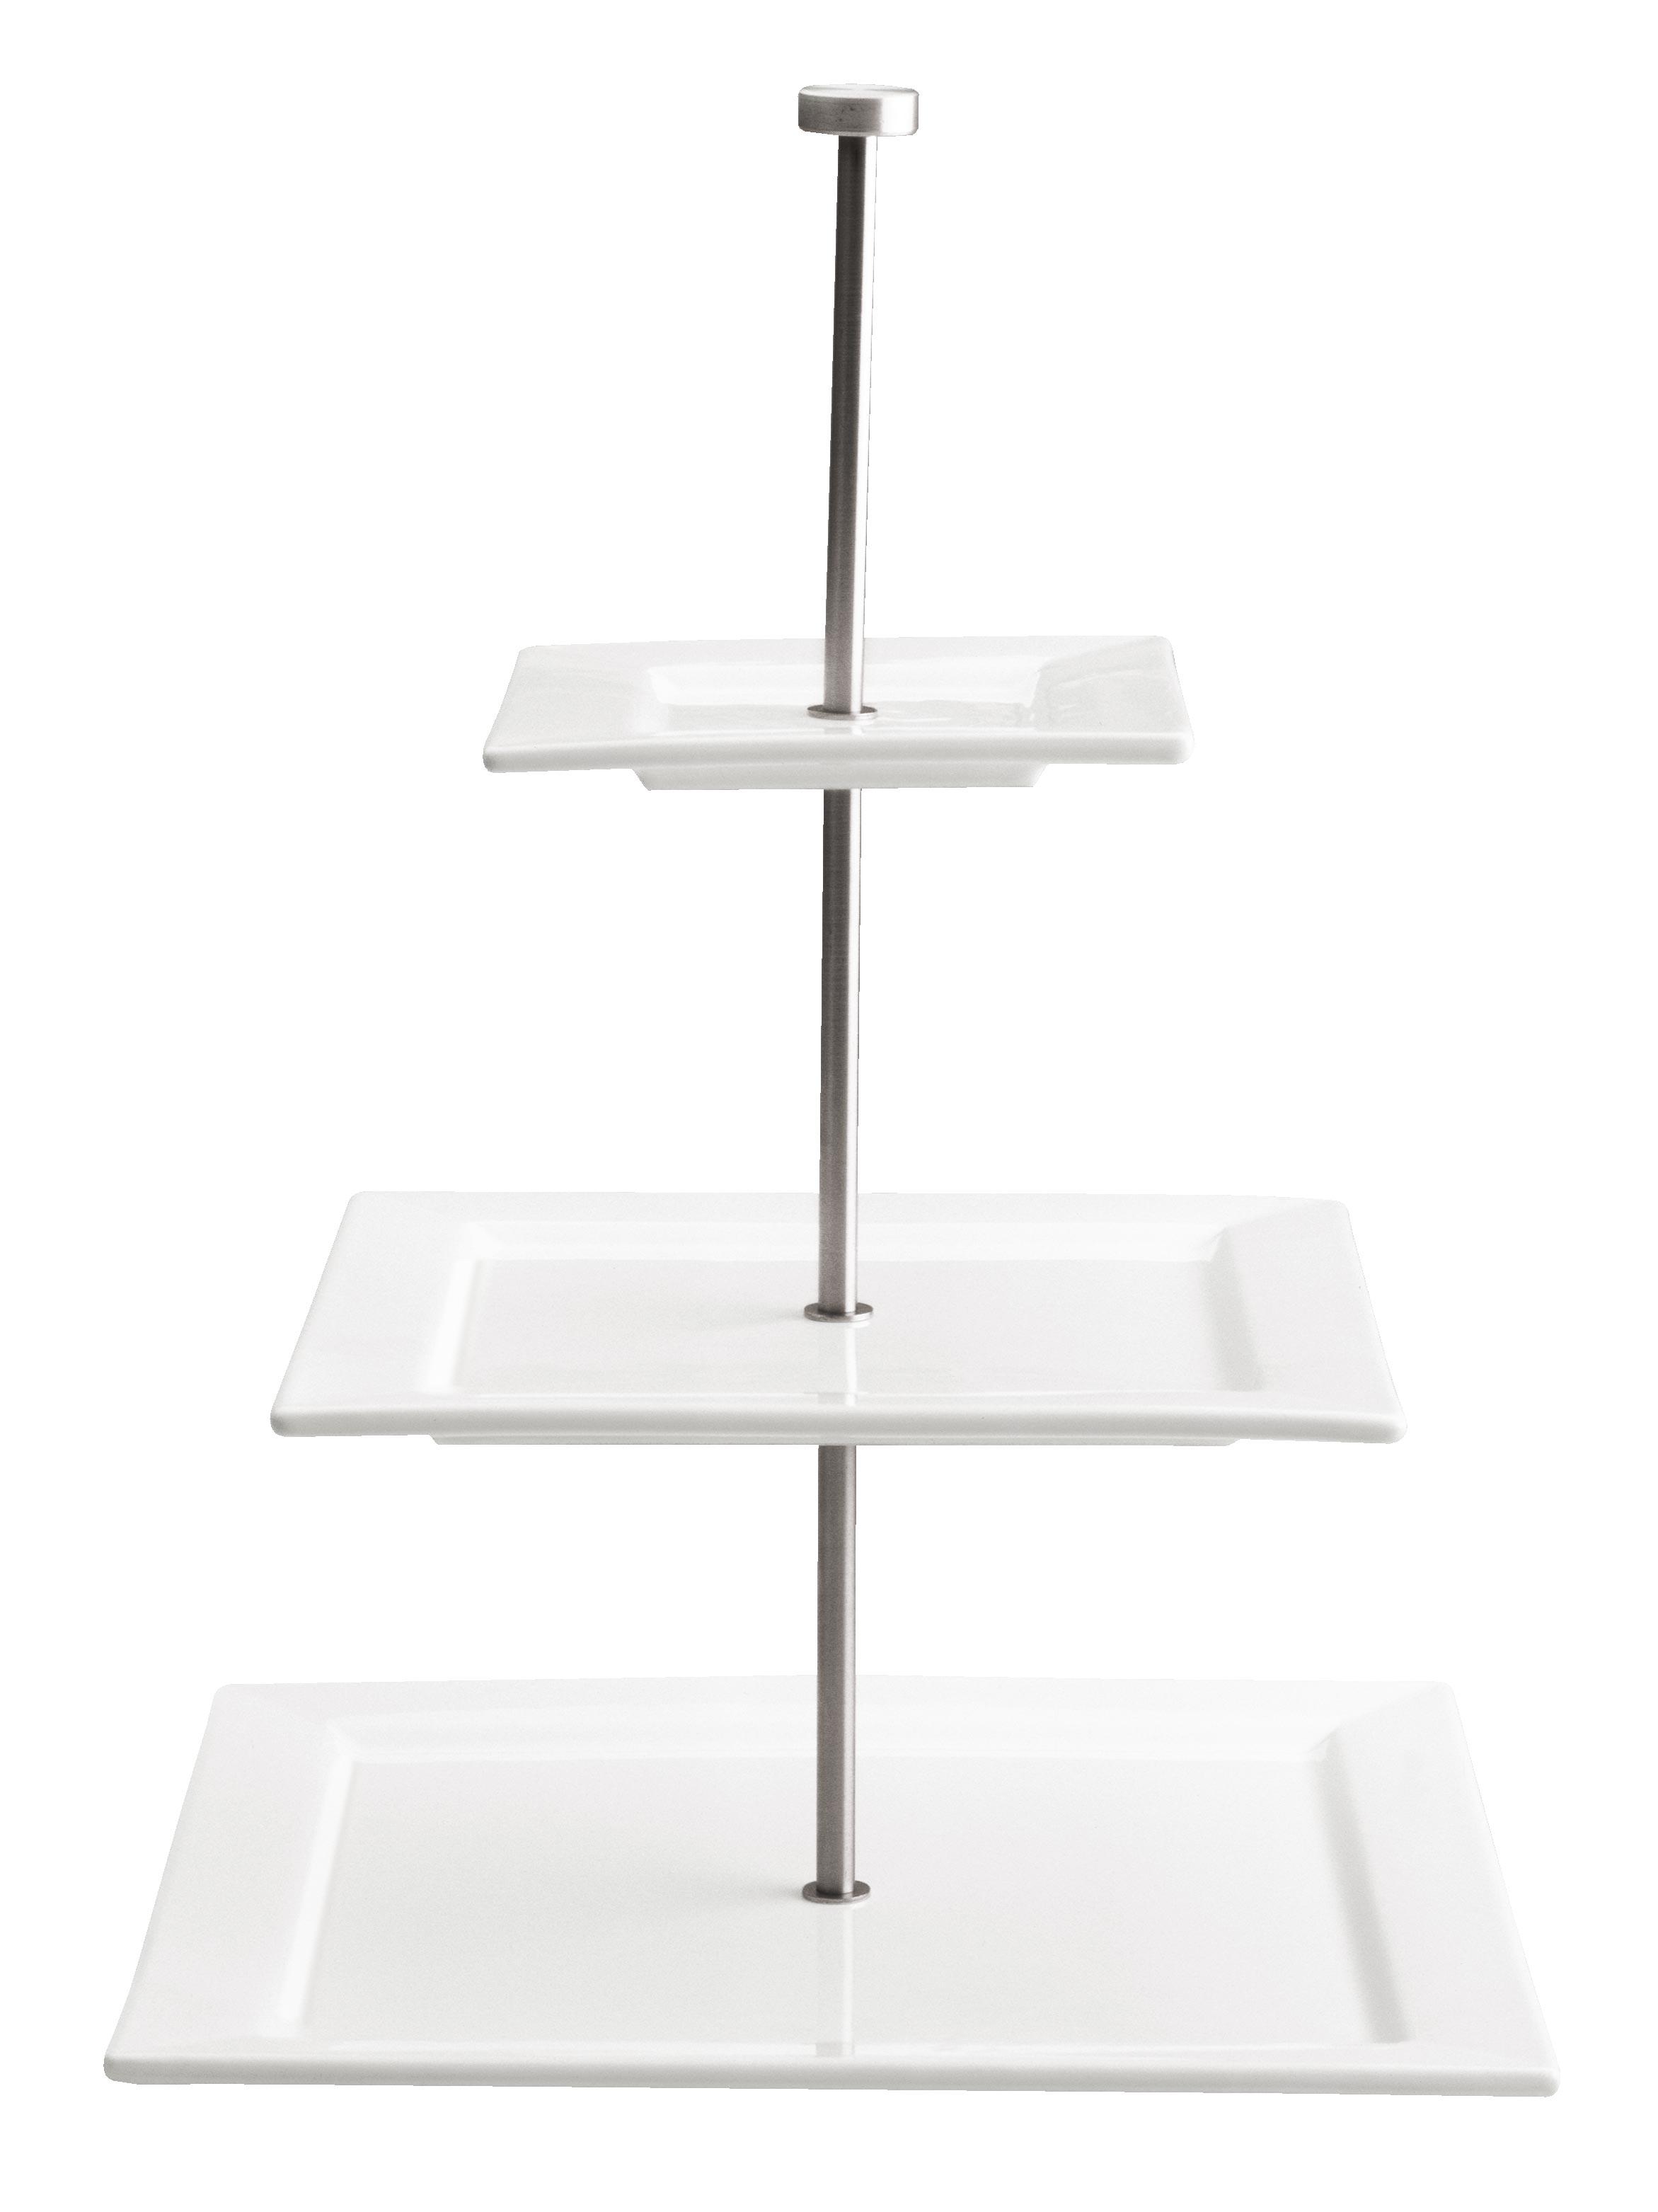 etagere 3 stufig produkte home by asa die asa. Black Bedroom Furniture Sets. Home Design Ideas